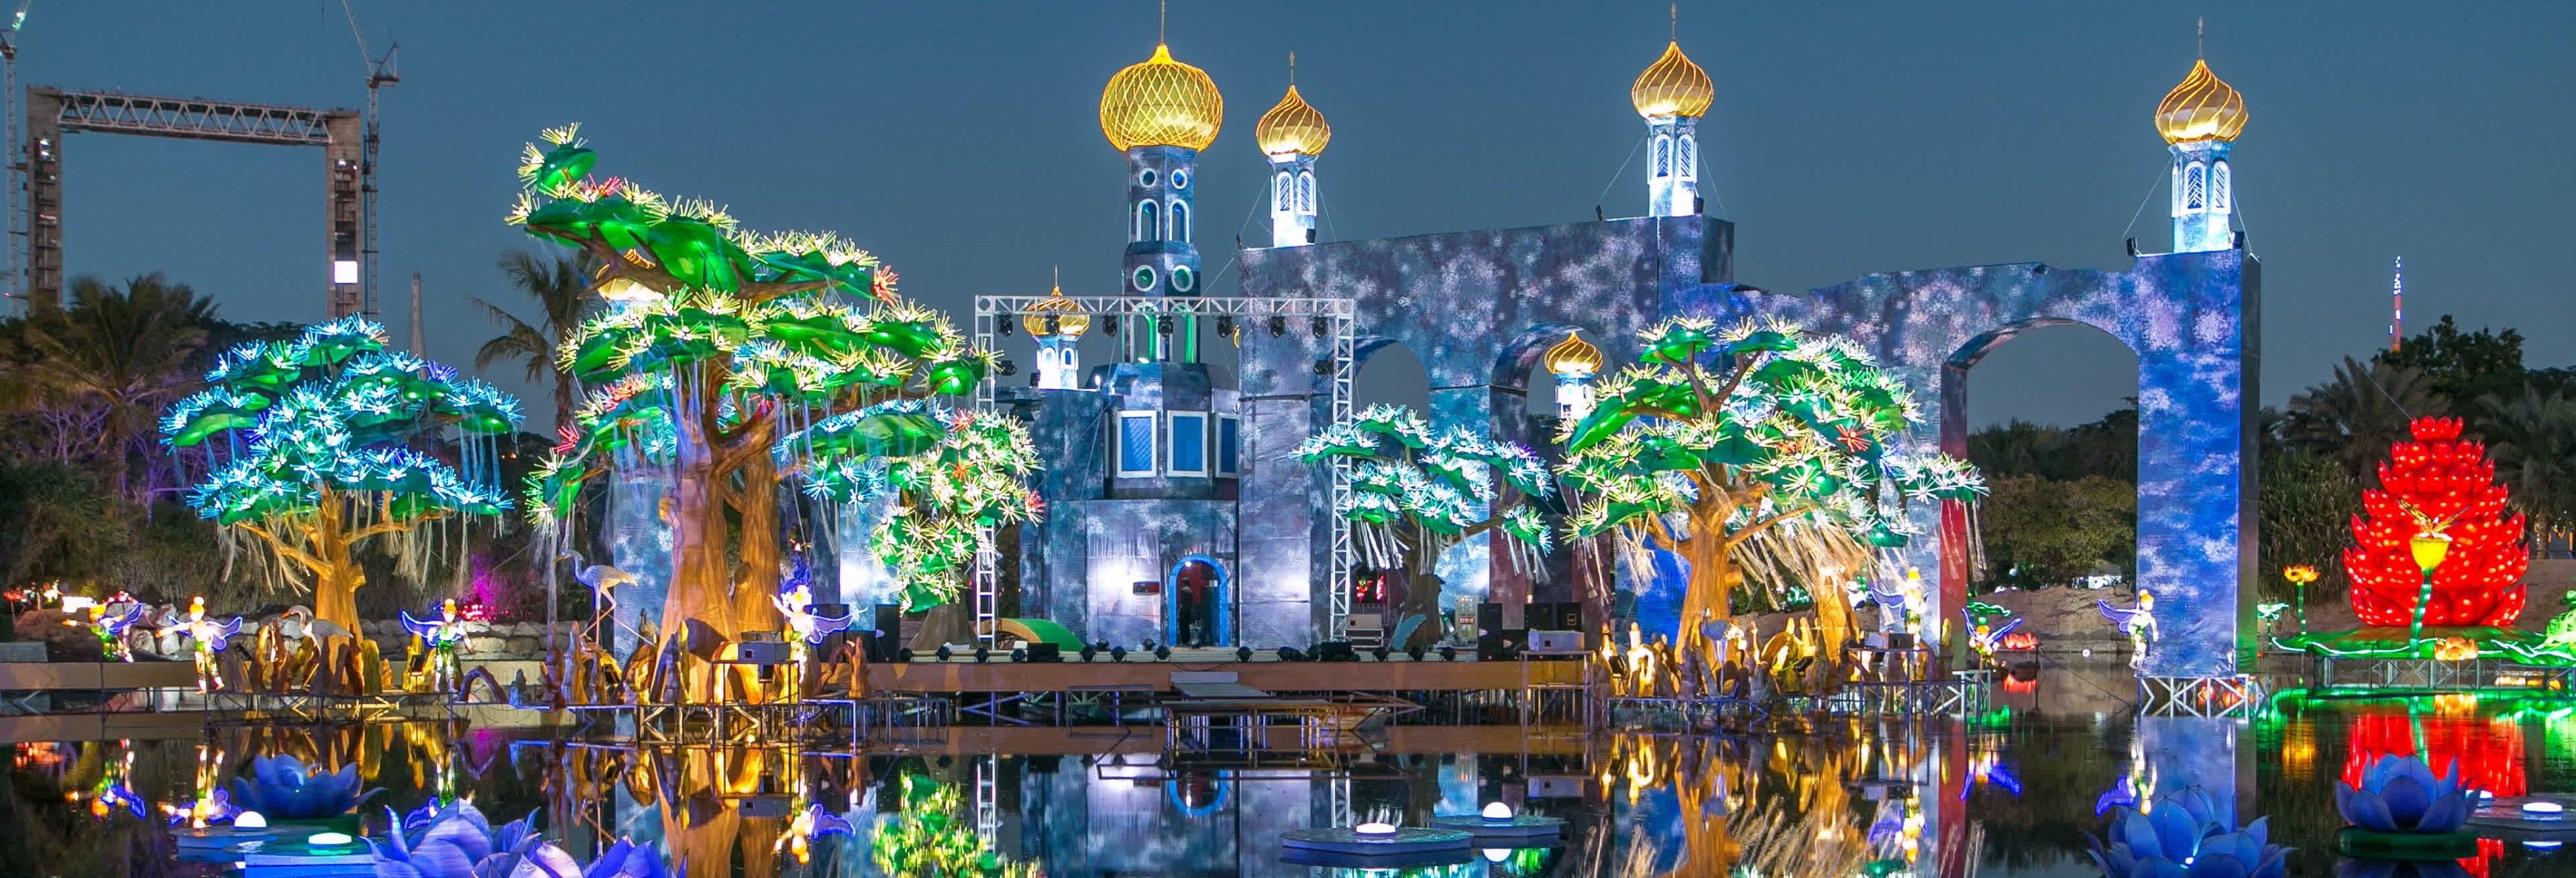 Ingresso do Dubai Garden Glow